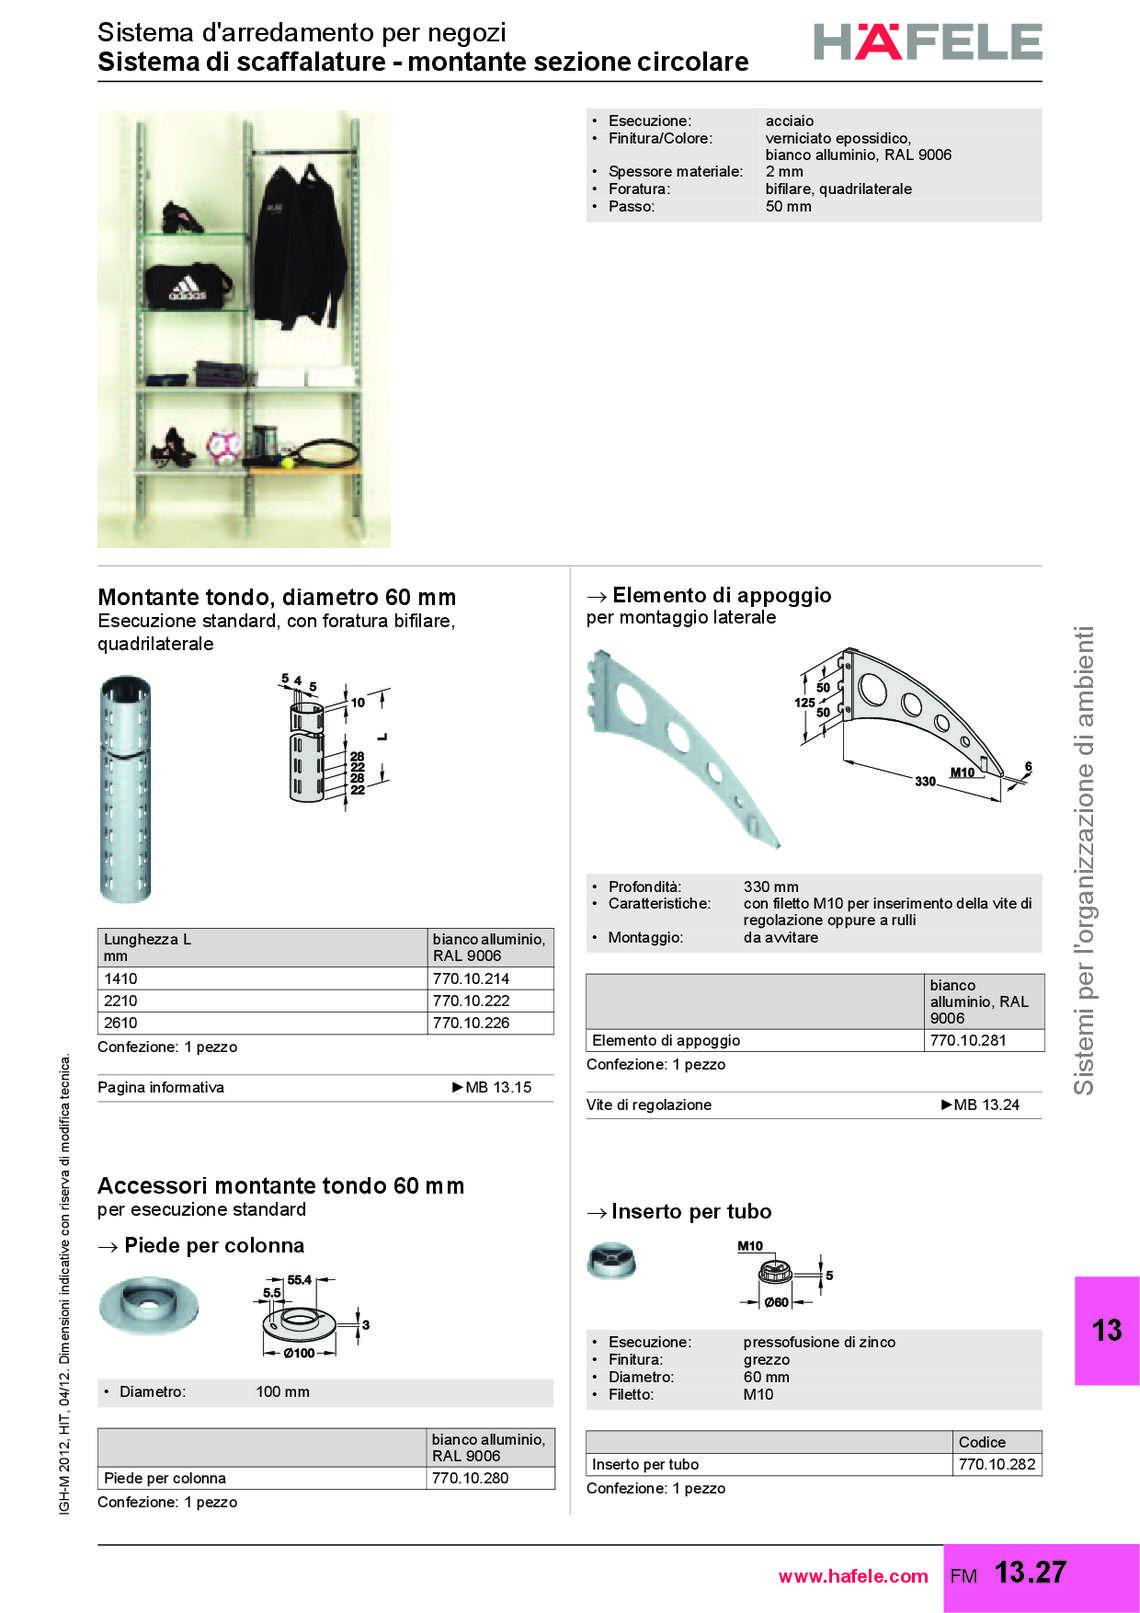 hafele-arredo-negozi-e-farmacie_32_038.jpg